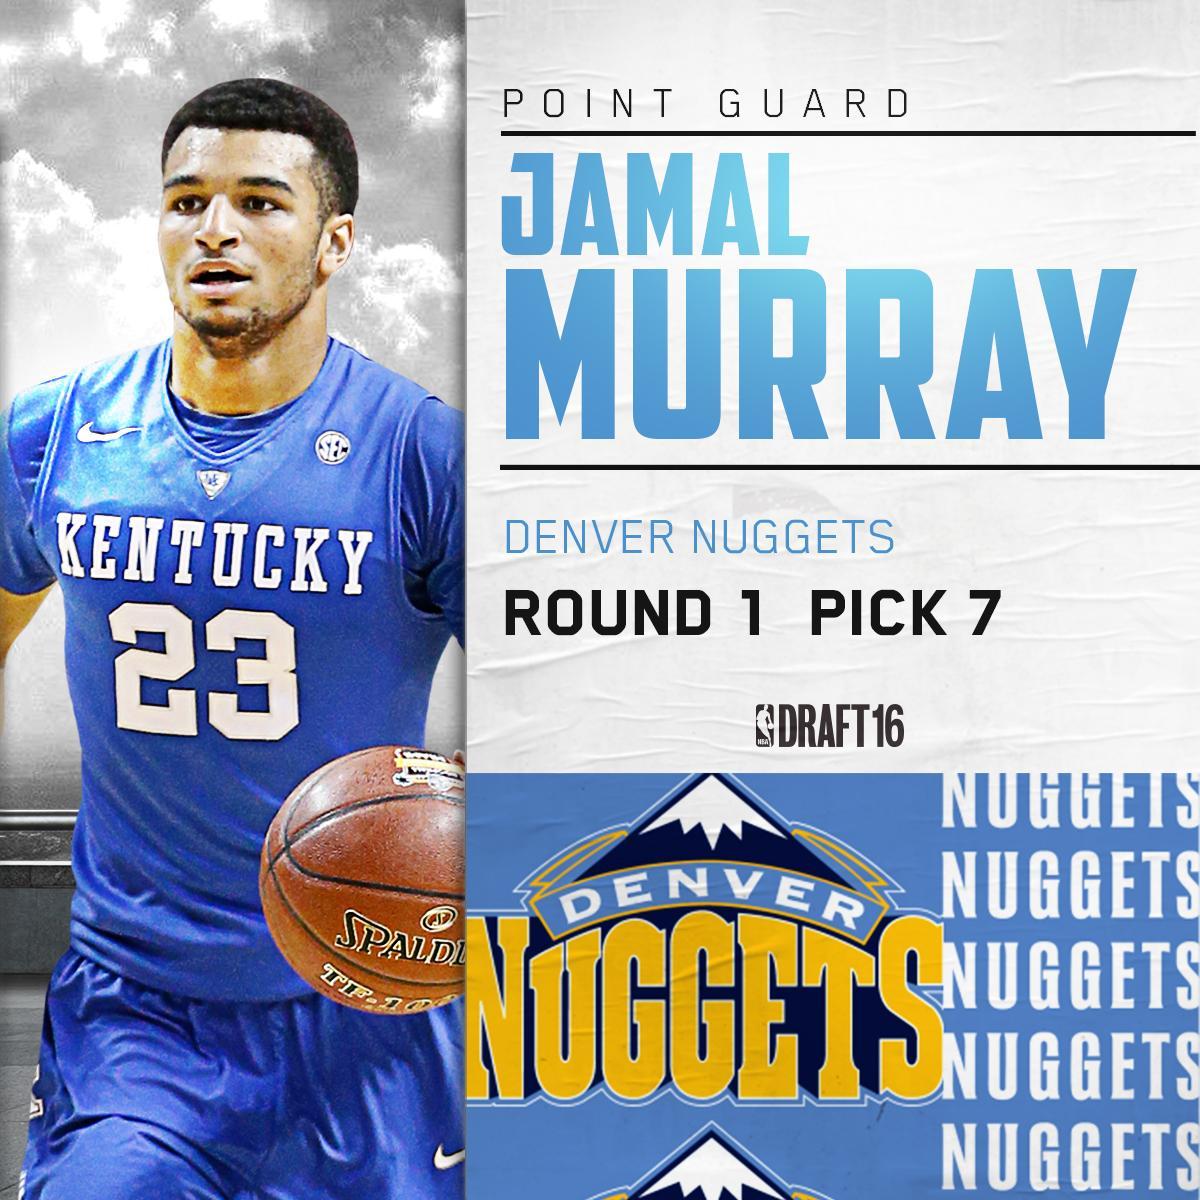 Nuggets Murray: (SUMMER LEAGUE) Minnesota Timberwolves Vs. Denver Nuggets